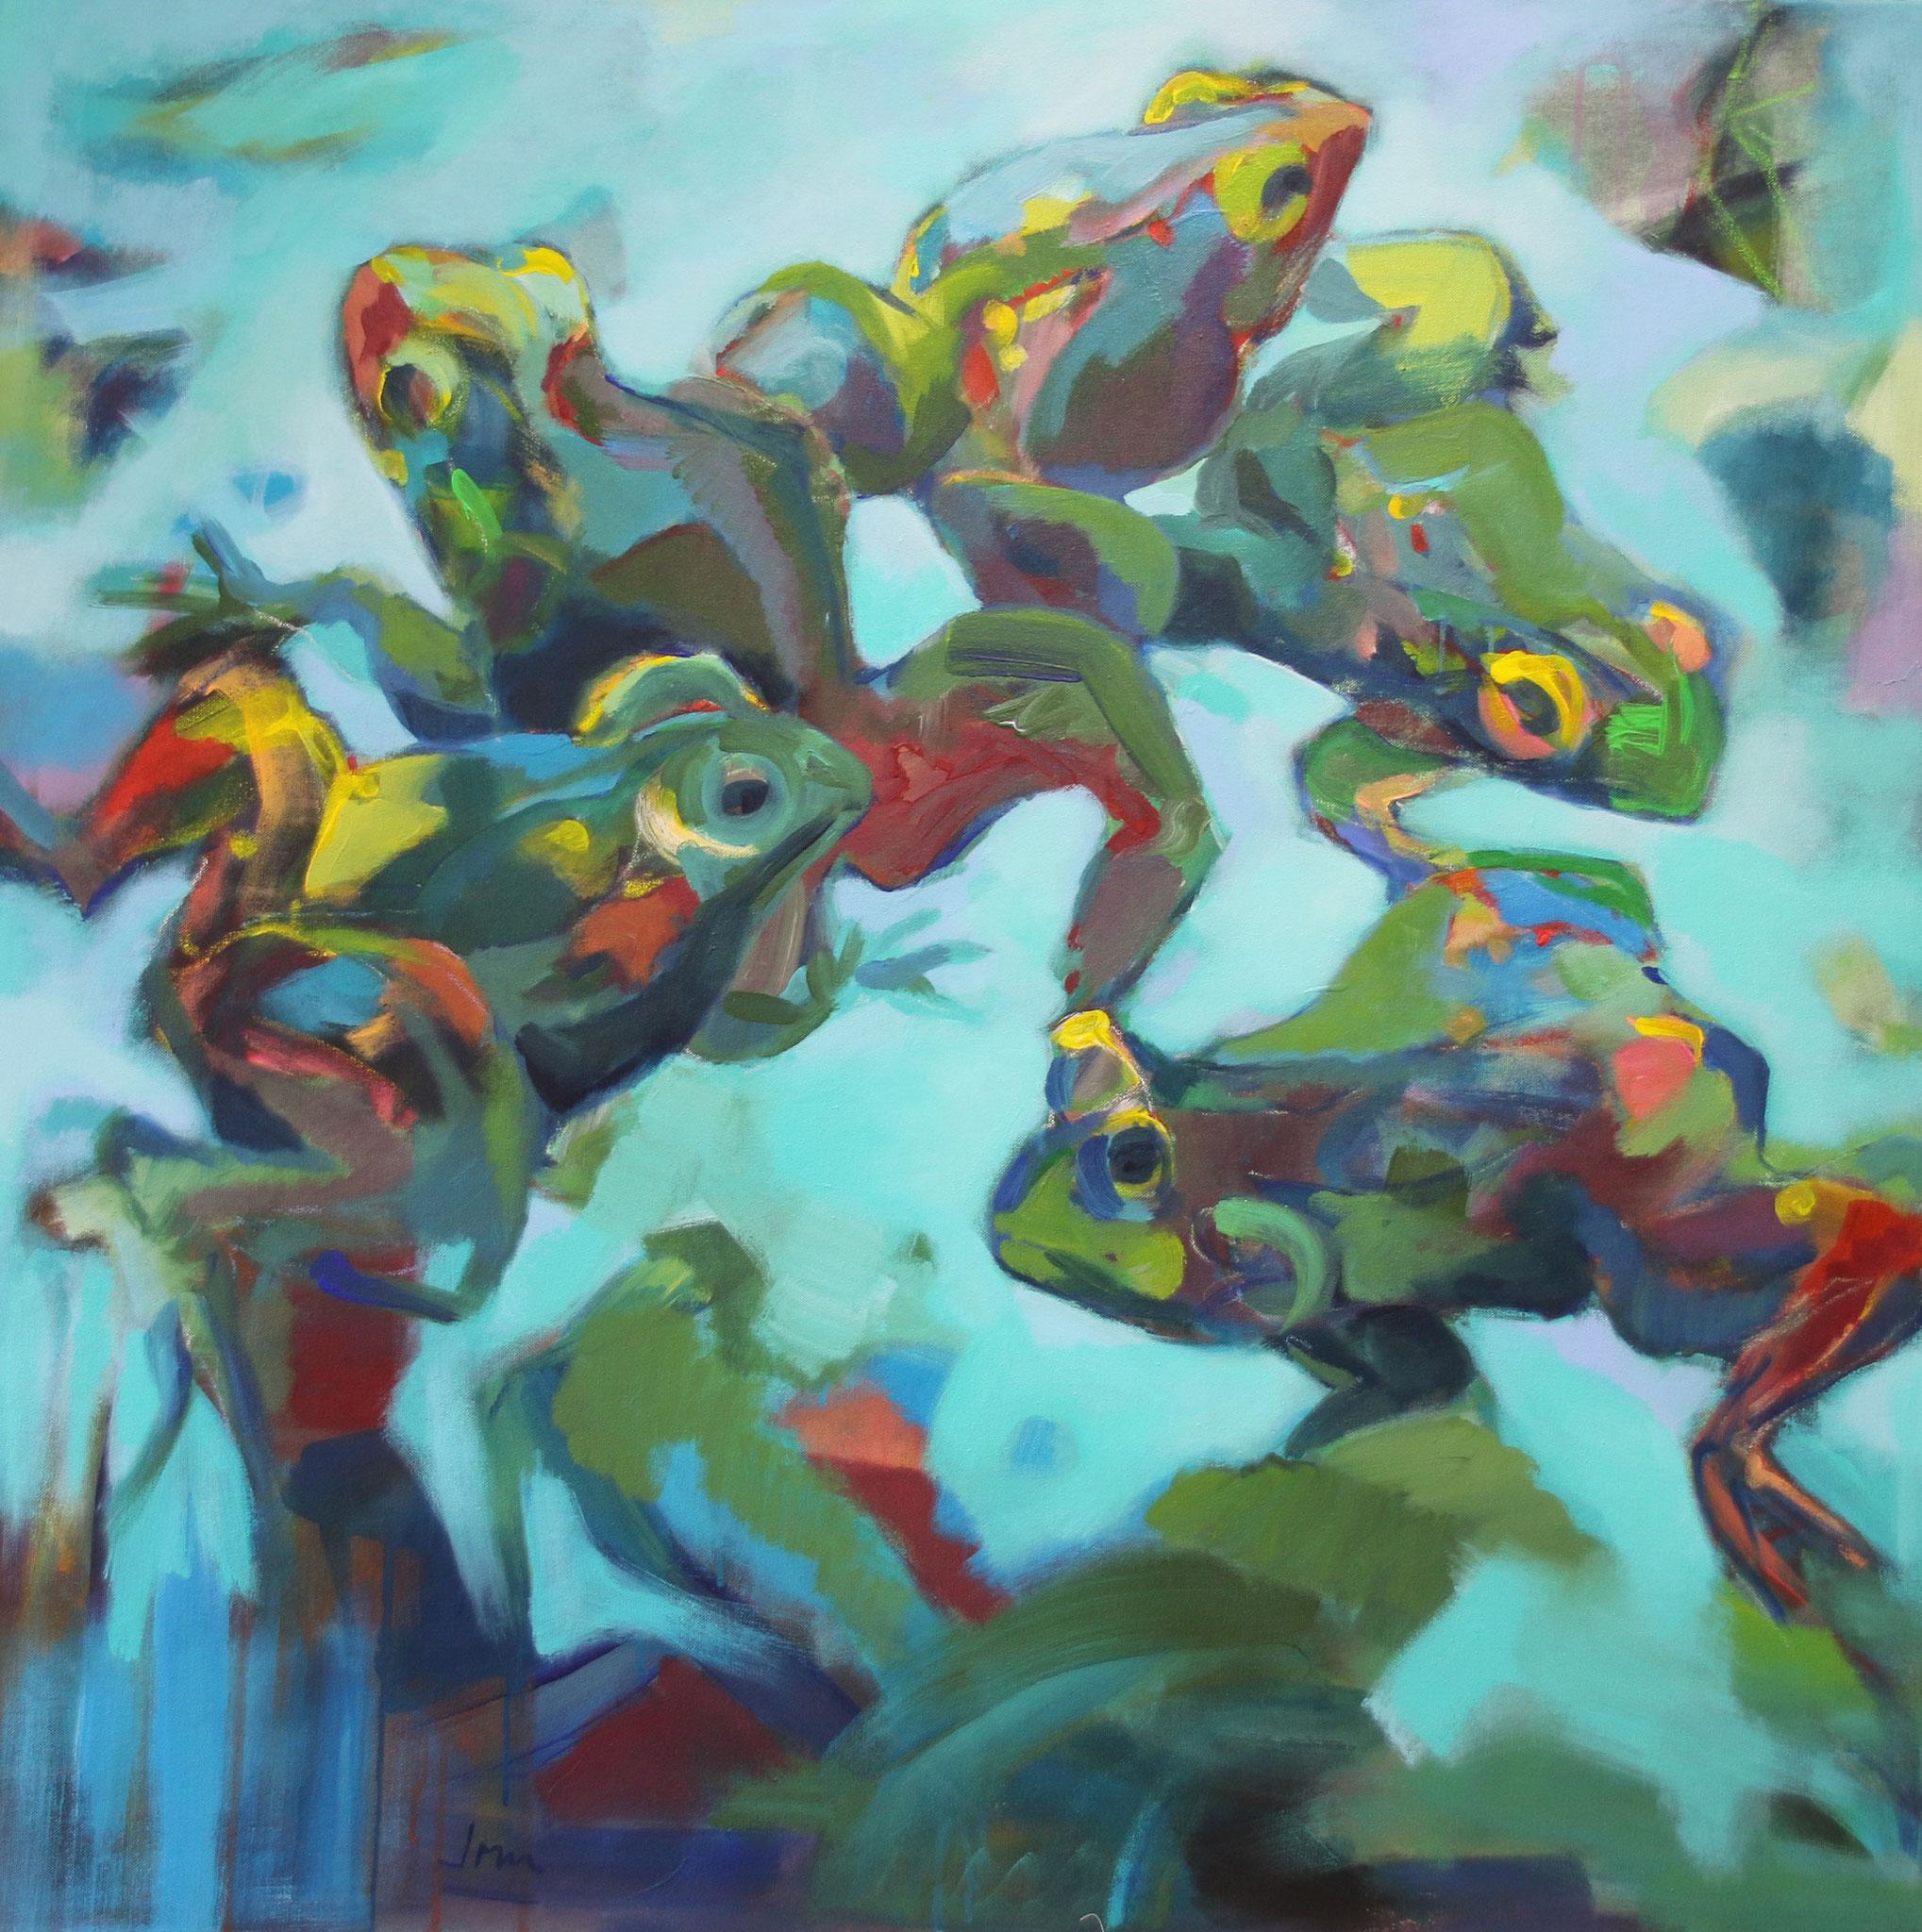 Frösche, 2020, Acryl auf Leinwand, 100 x 100 cm